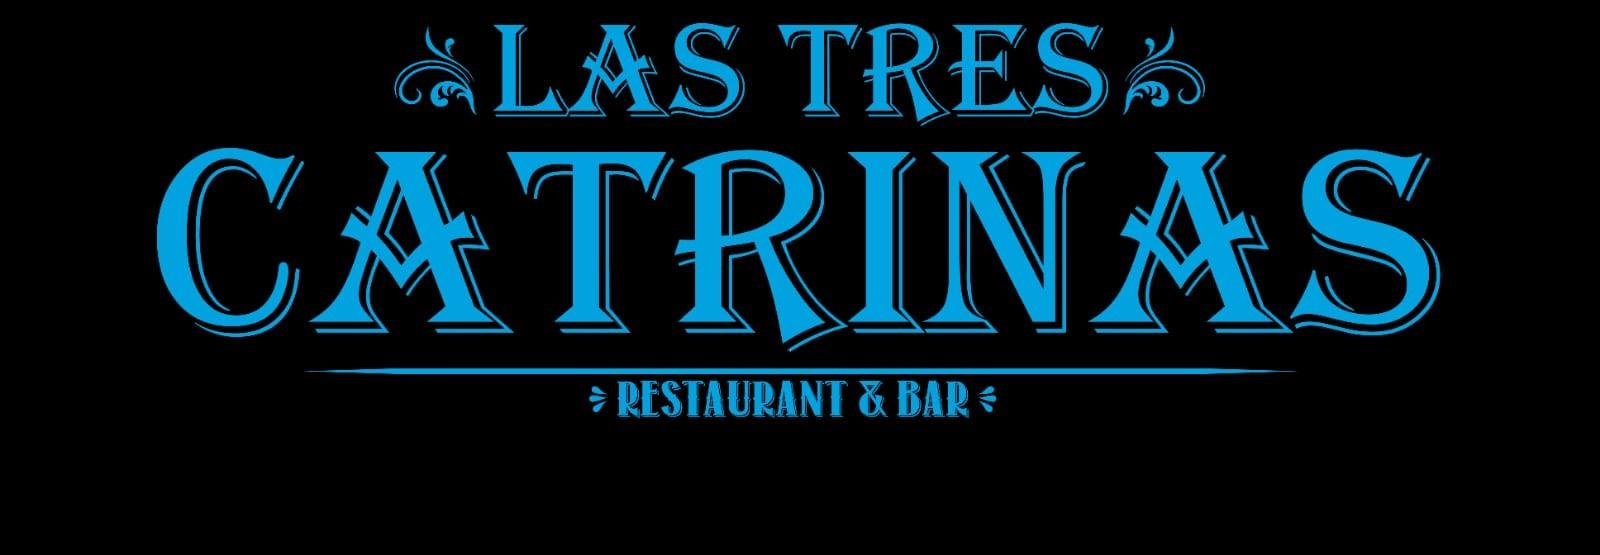 Las Tres Catrinas Restaurant Bar Logo